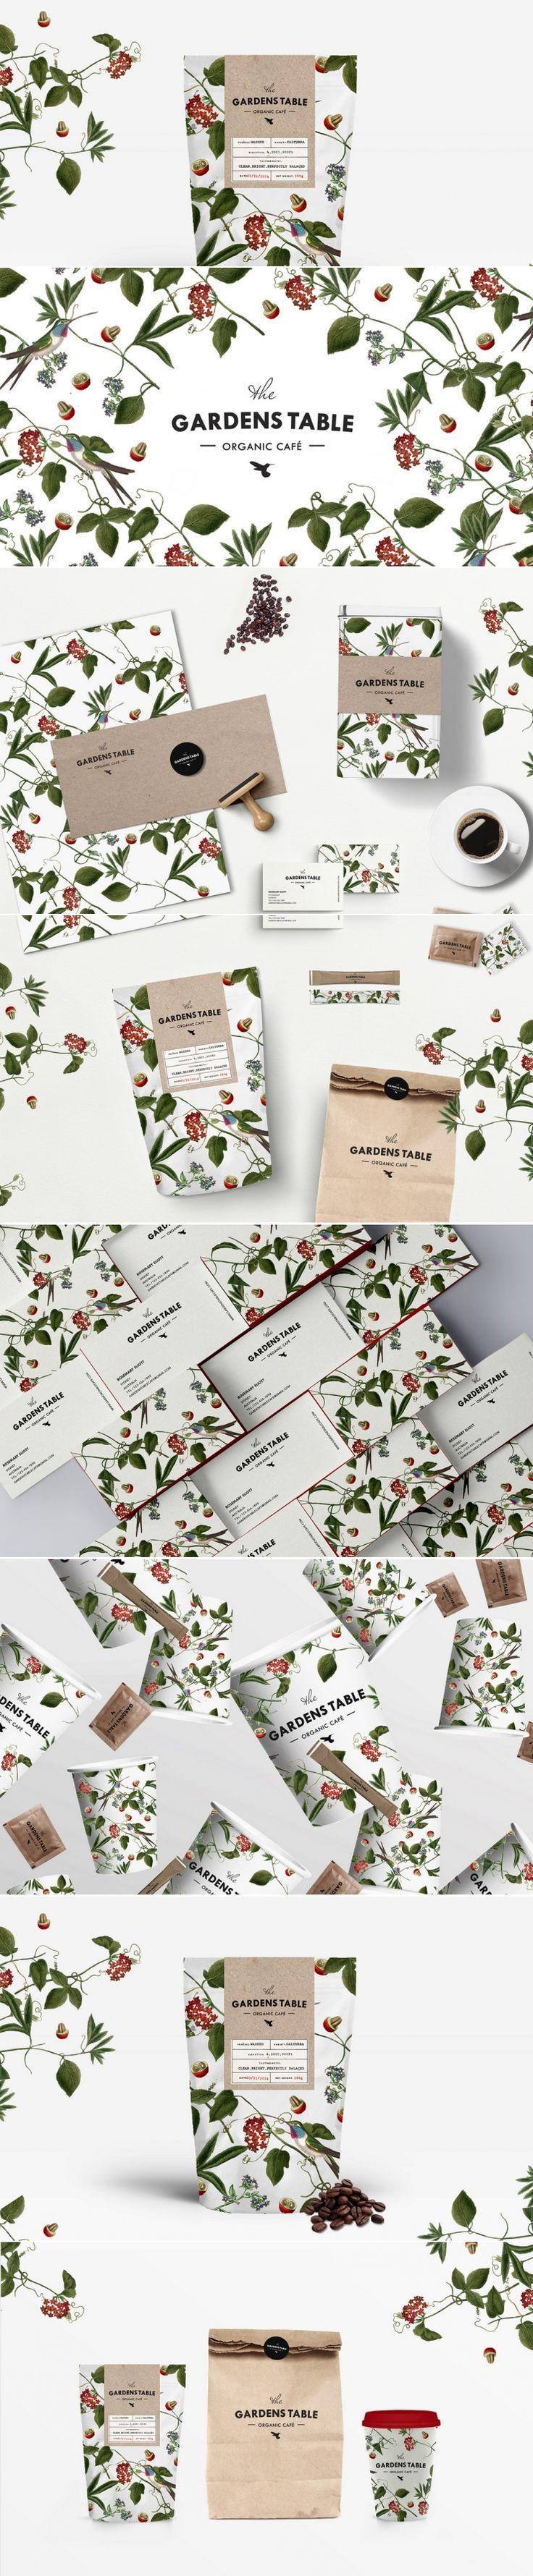 The Gardens Table organic café — The Dieline | Packaging & Branding Design & Innovation News